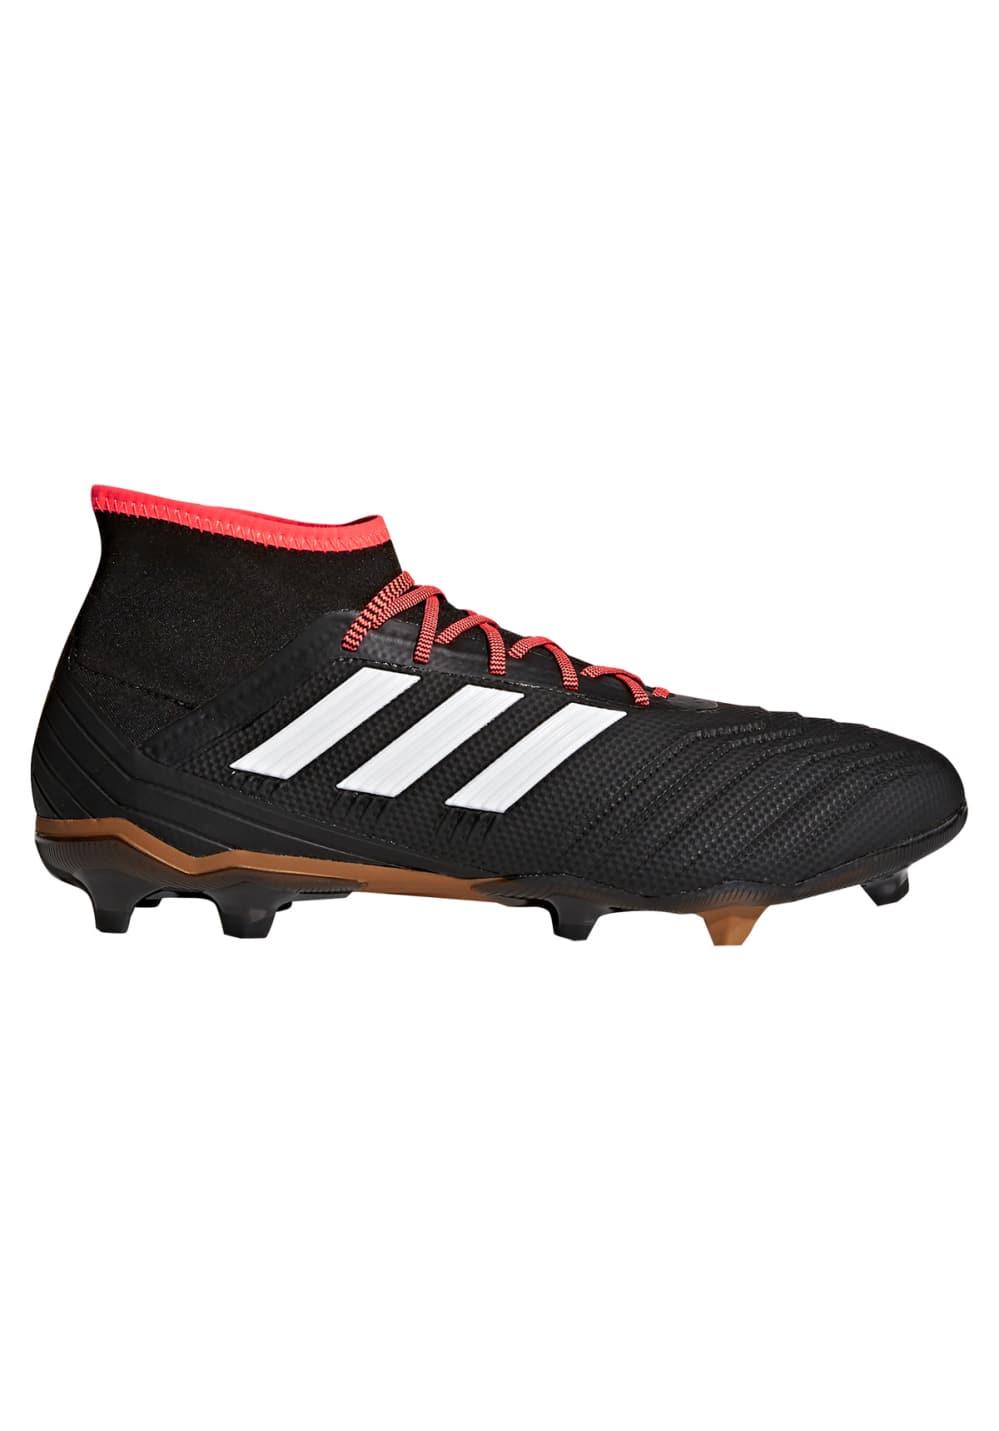 ... adidas Predator 18.2 Fg - Botas de futbol para Hombre - Negro. Volver.  -60% 3ac9e0ea3a6d0